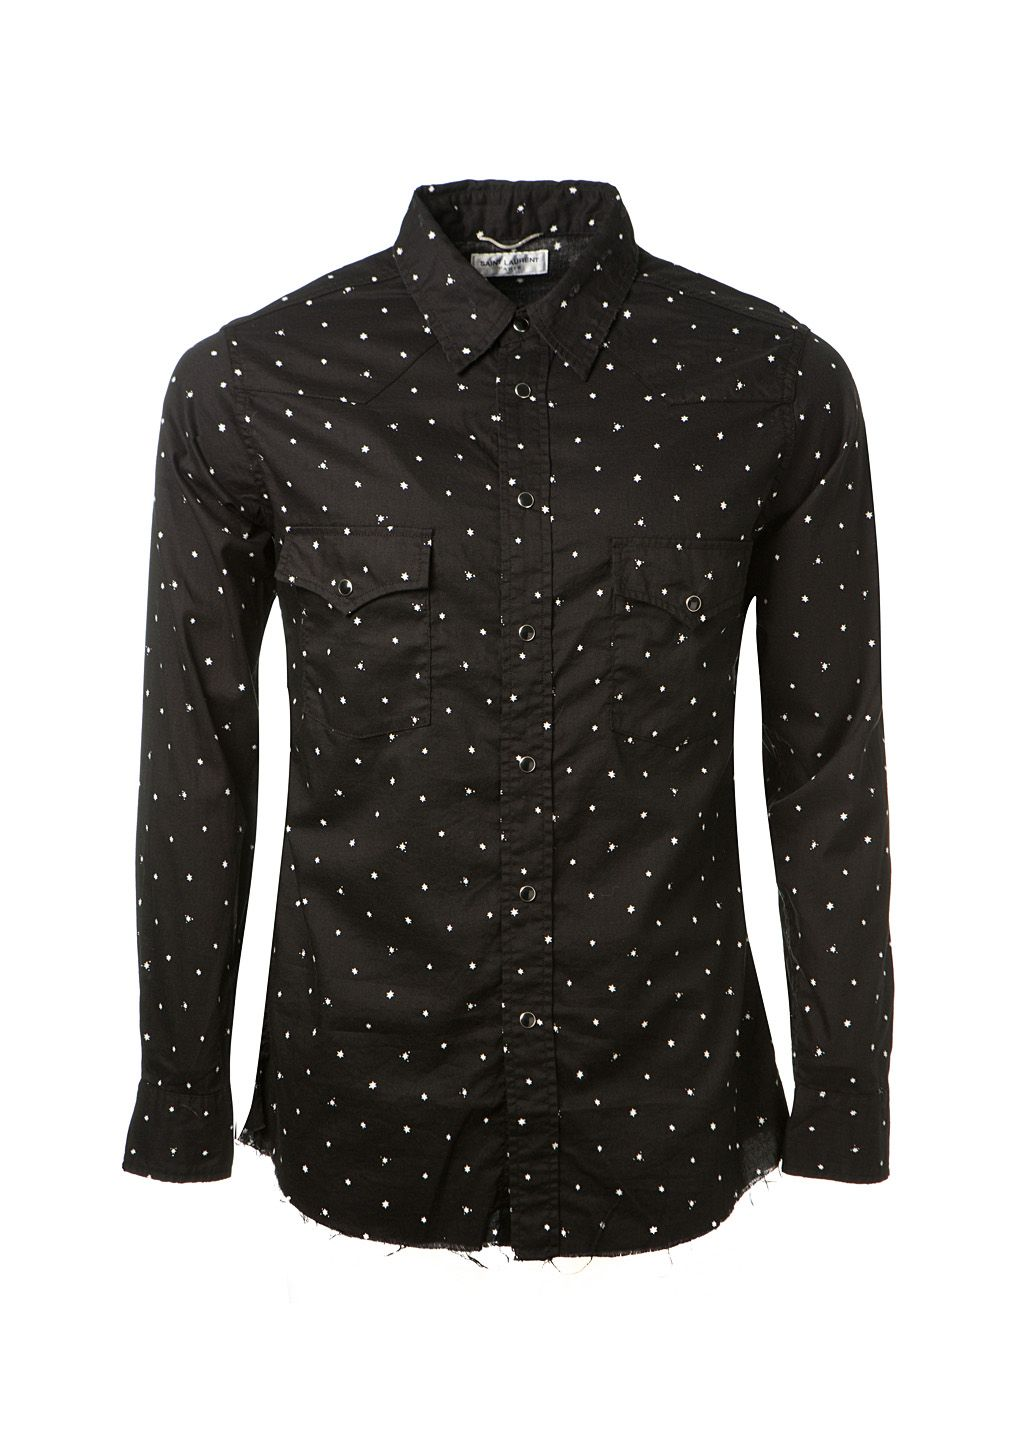 73929ba779dfa2 SAINT LAURENT Saint Laurent White Stars Printed Black Cotton Western Shirt.  #saintlaurent #cloth #